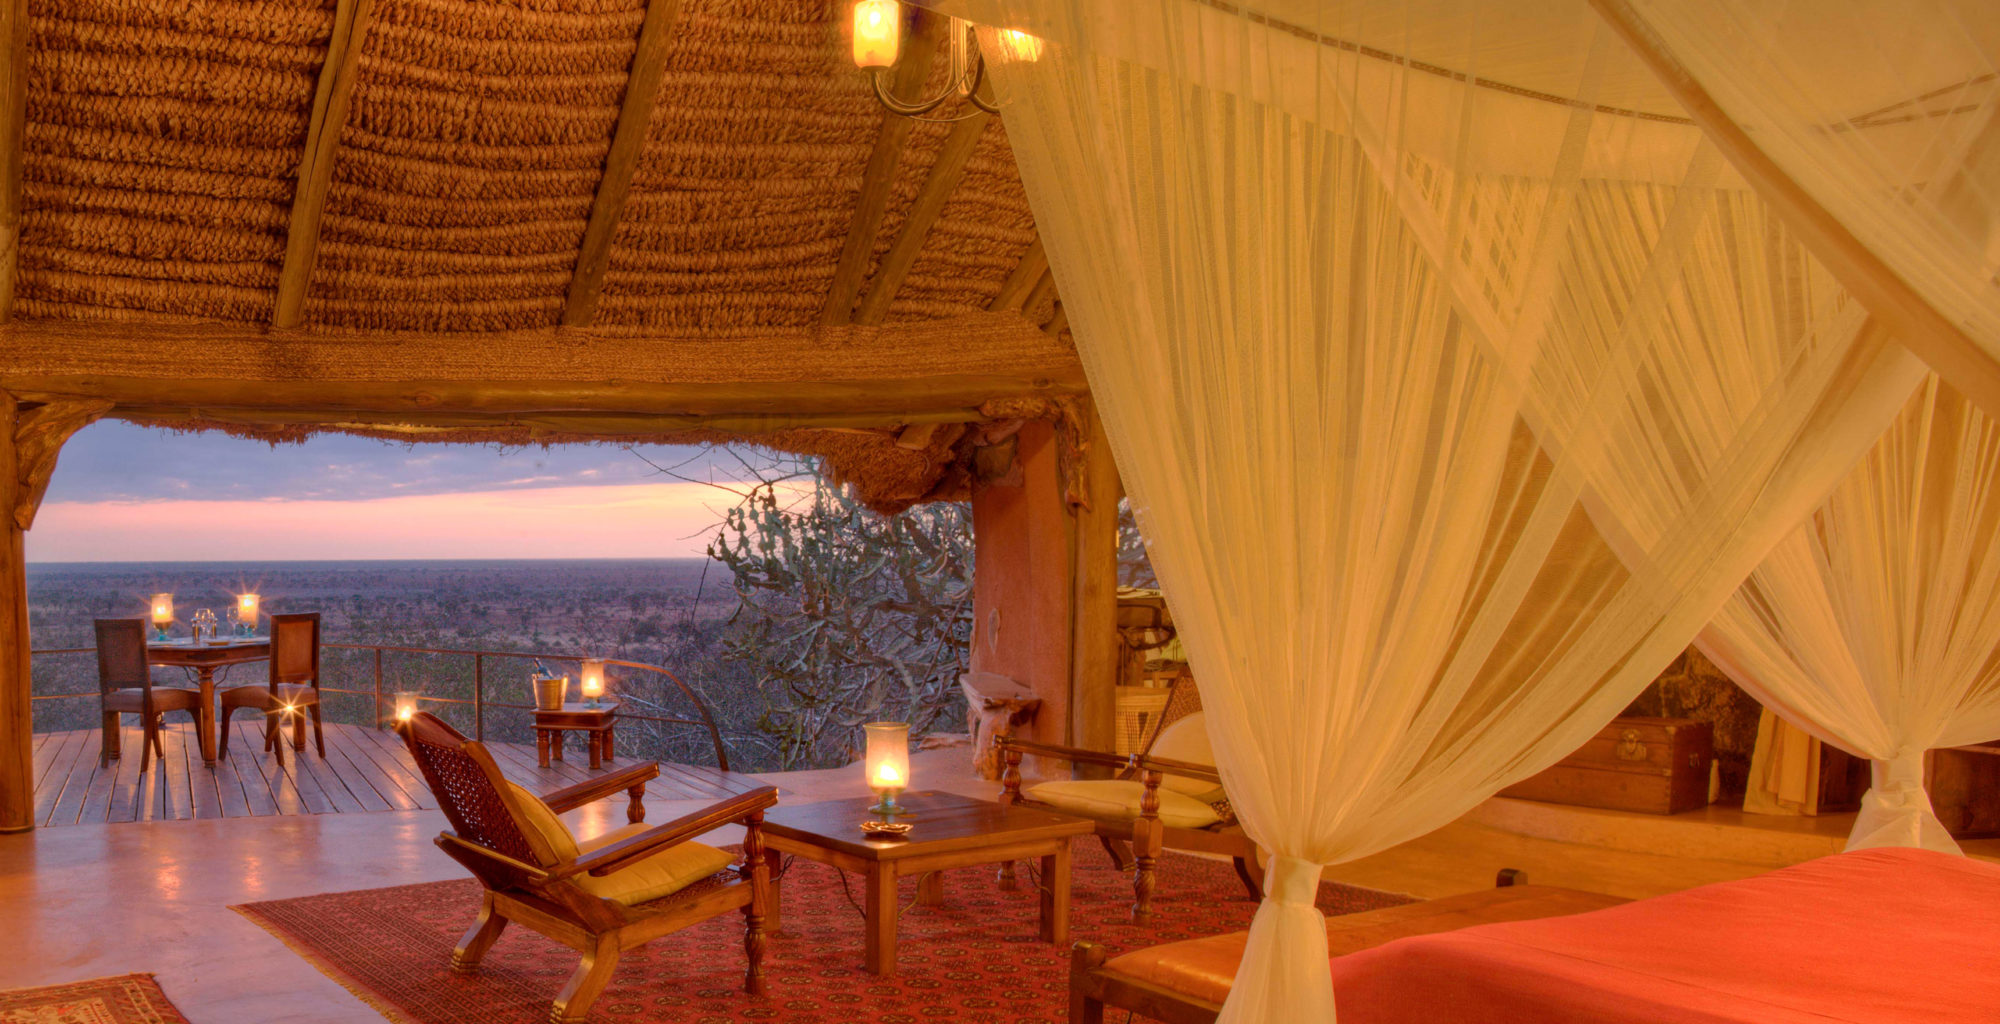 Elsa's-Kopje-Kenya-Meru-Bedroom-Lounge